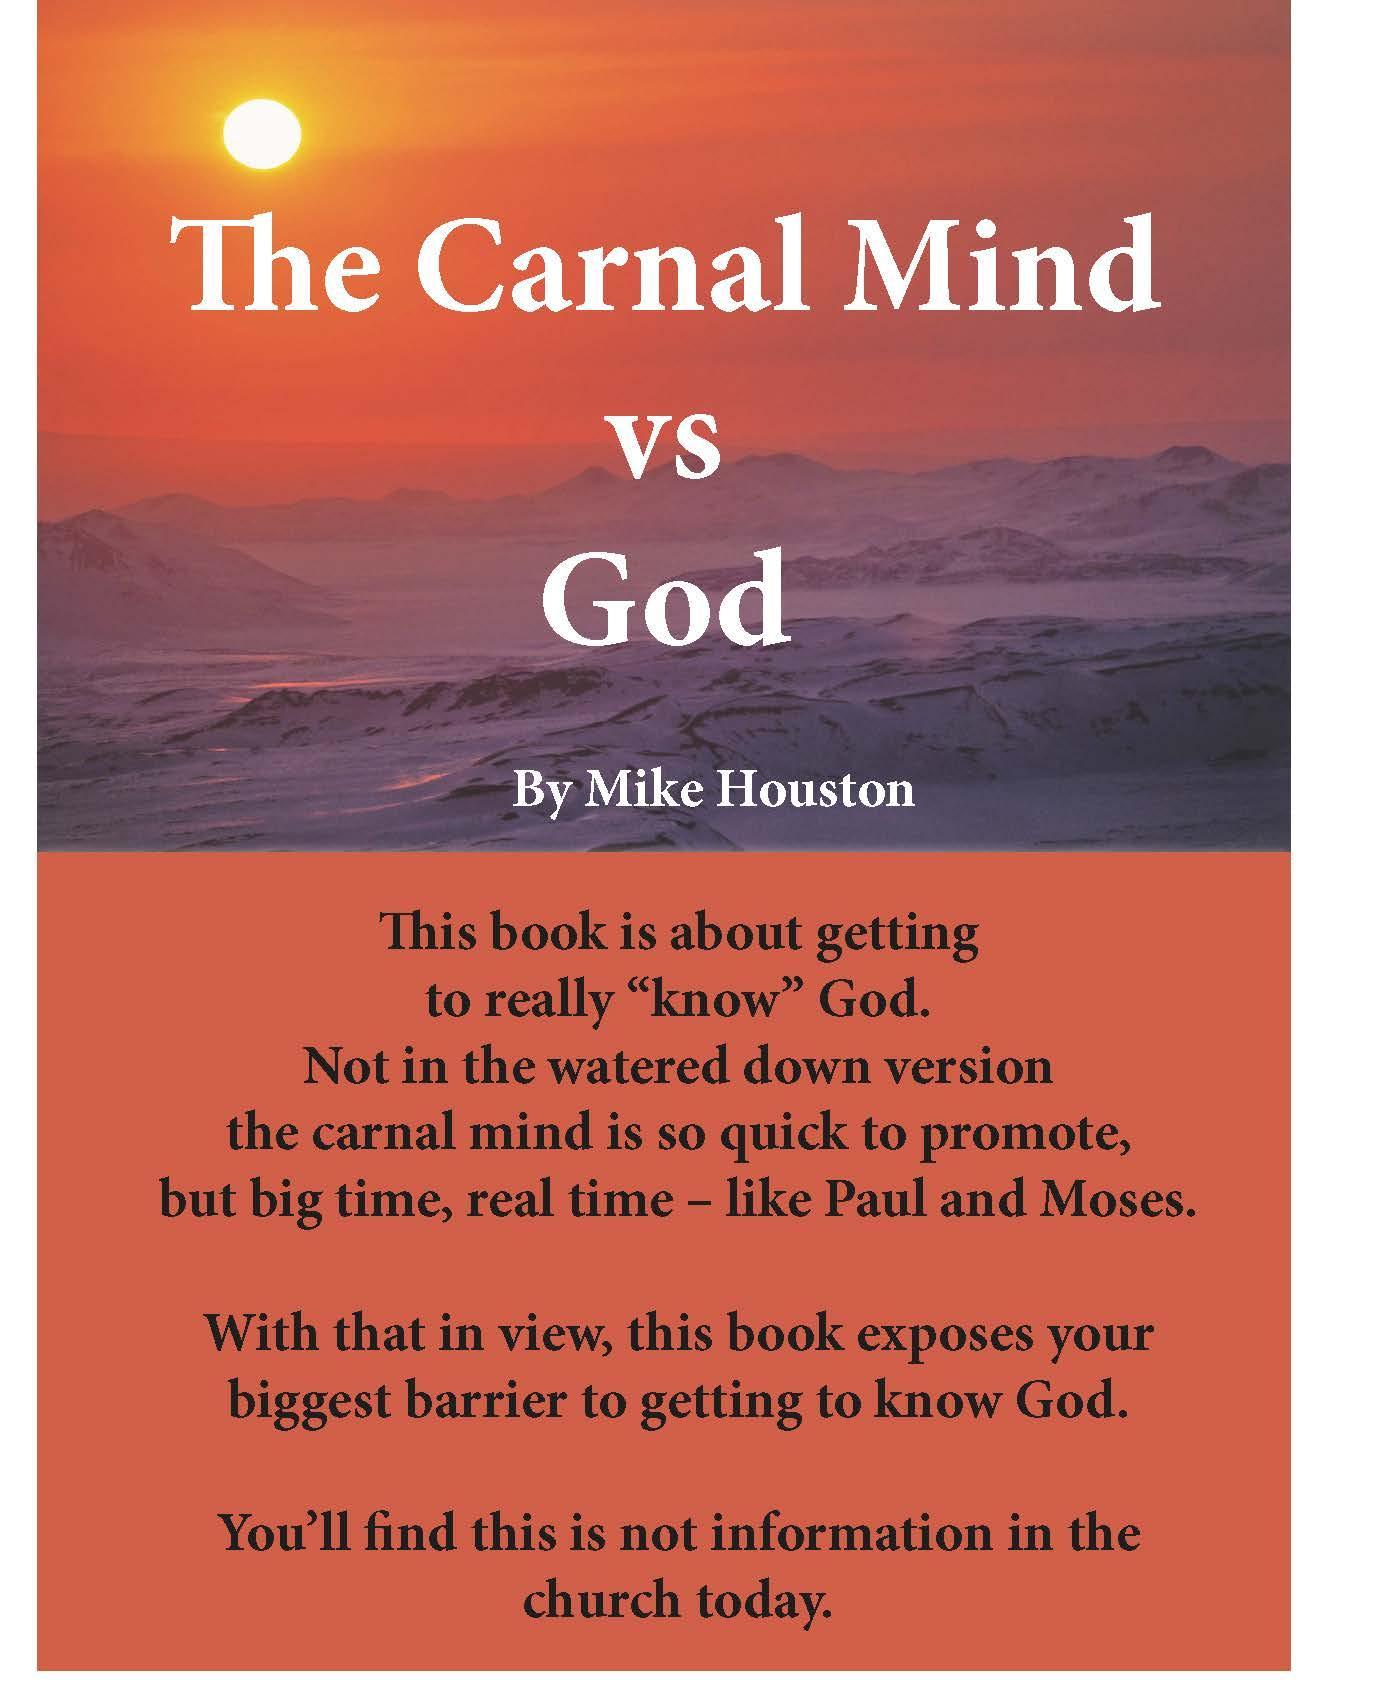 The Carnal Mind vs God